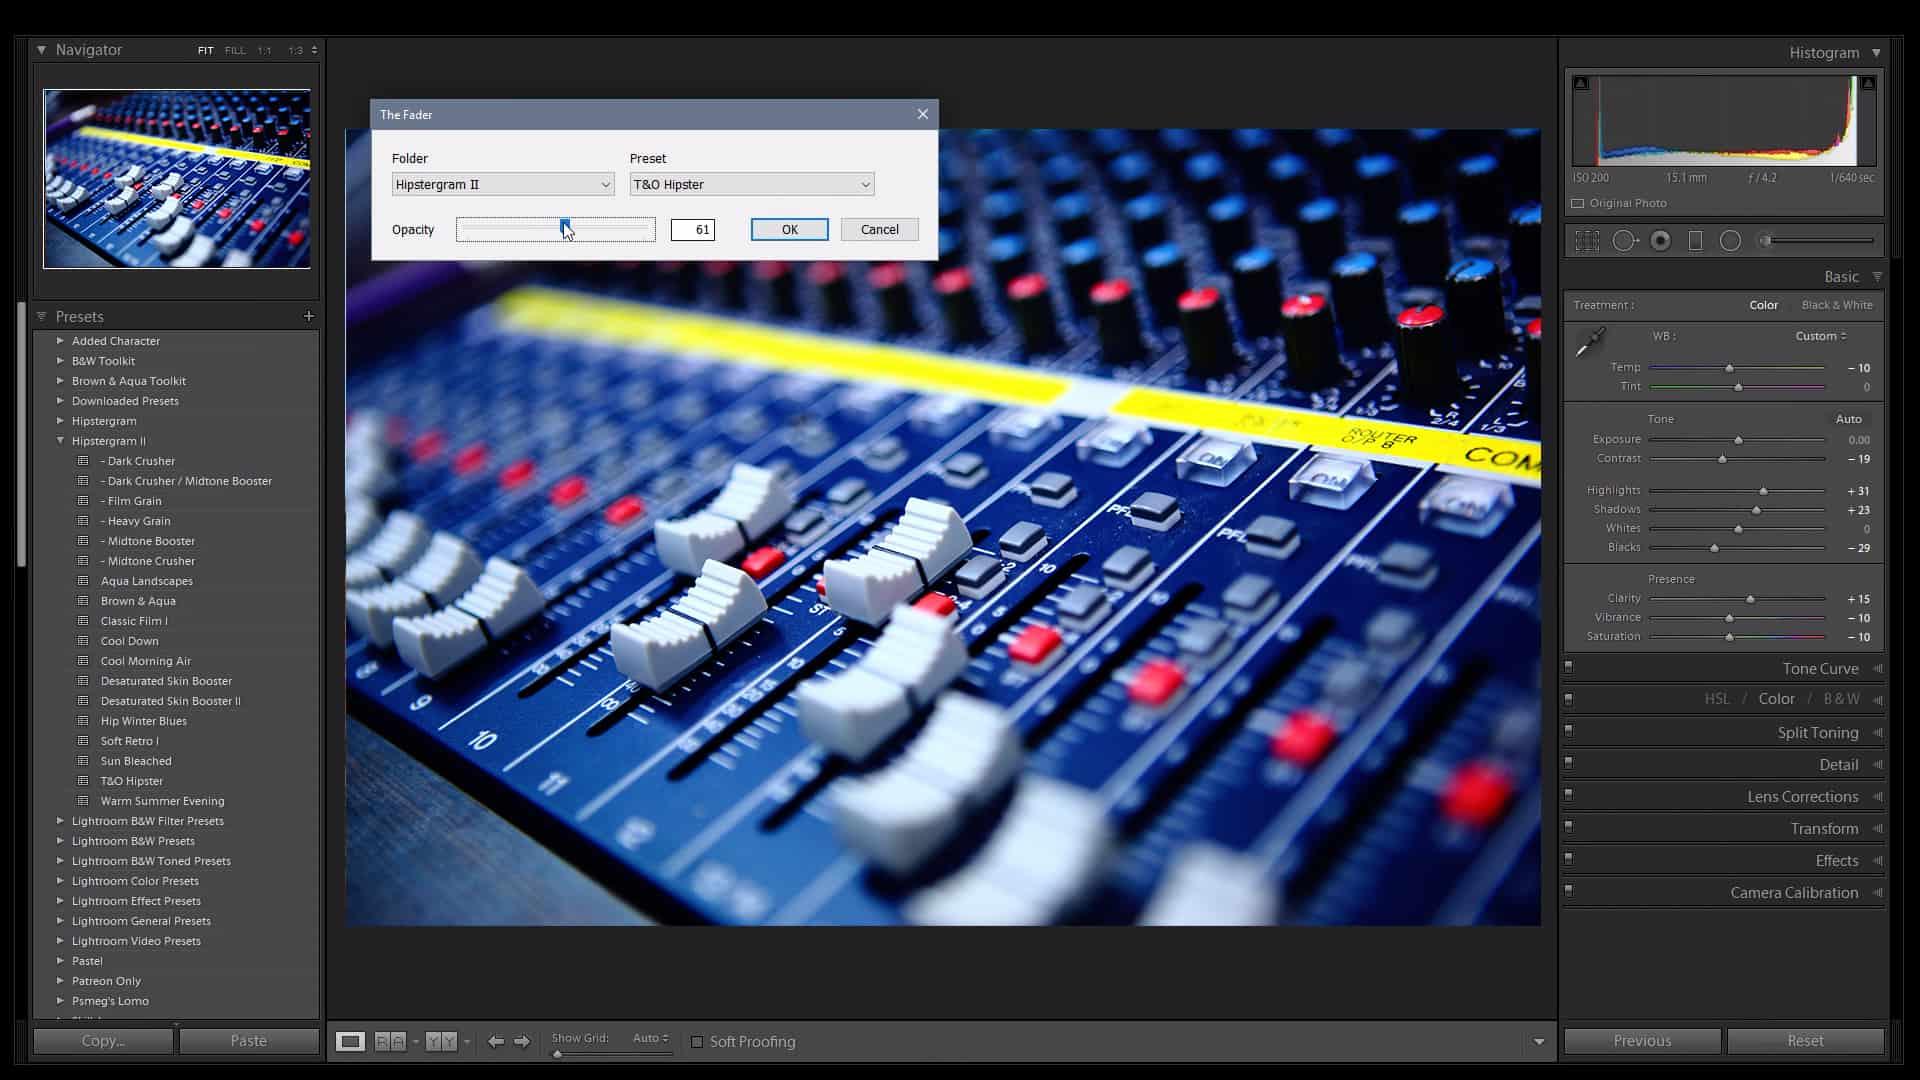 The Fader - Adobe Lightroom presets opacity plugin